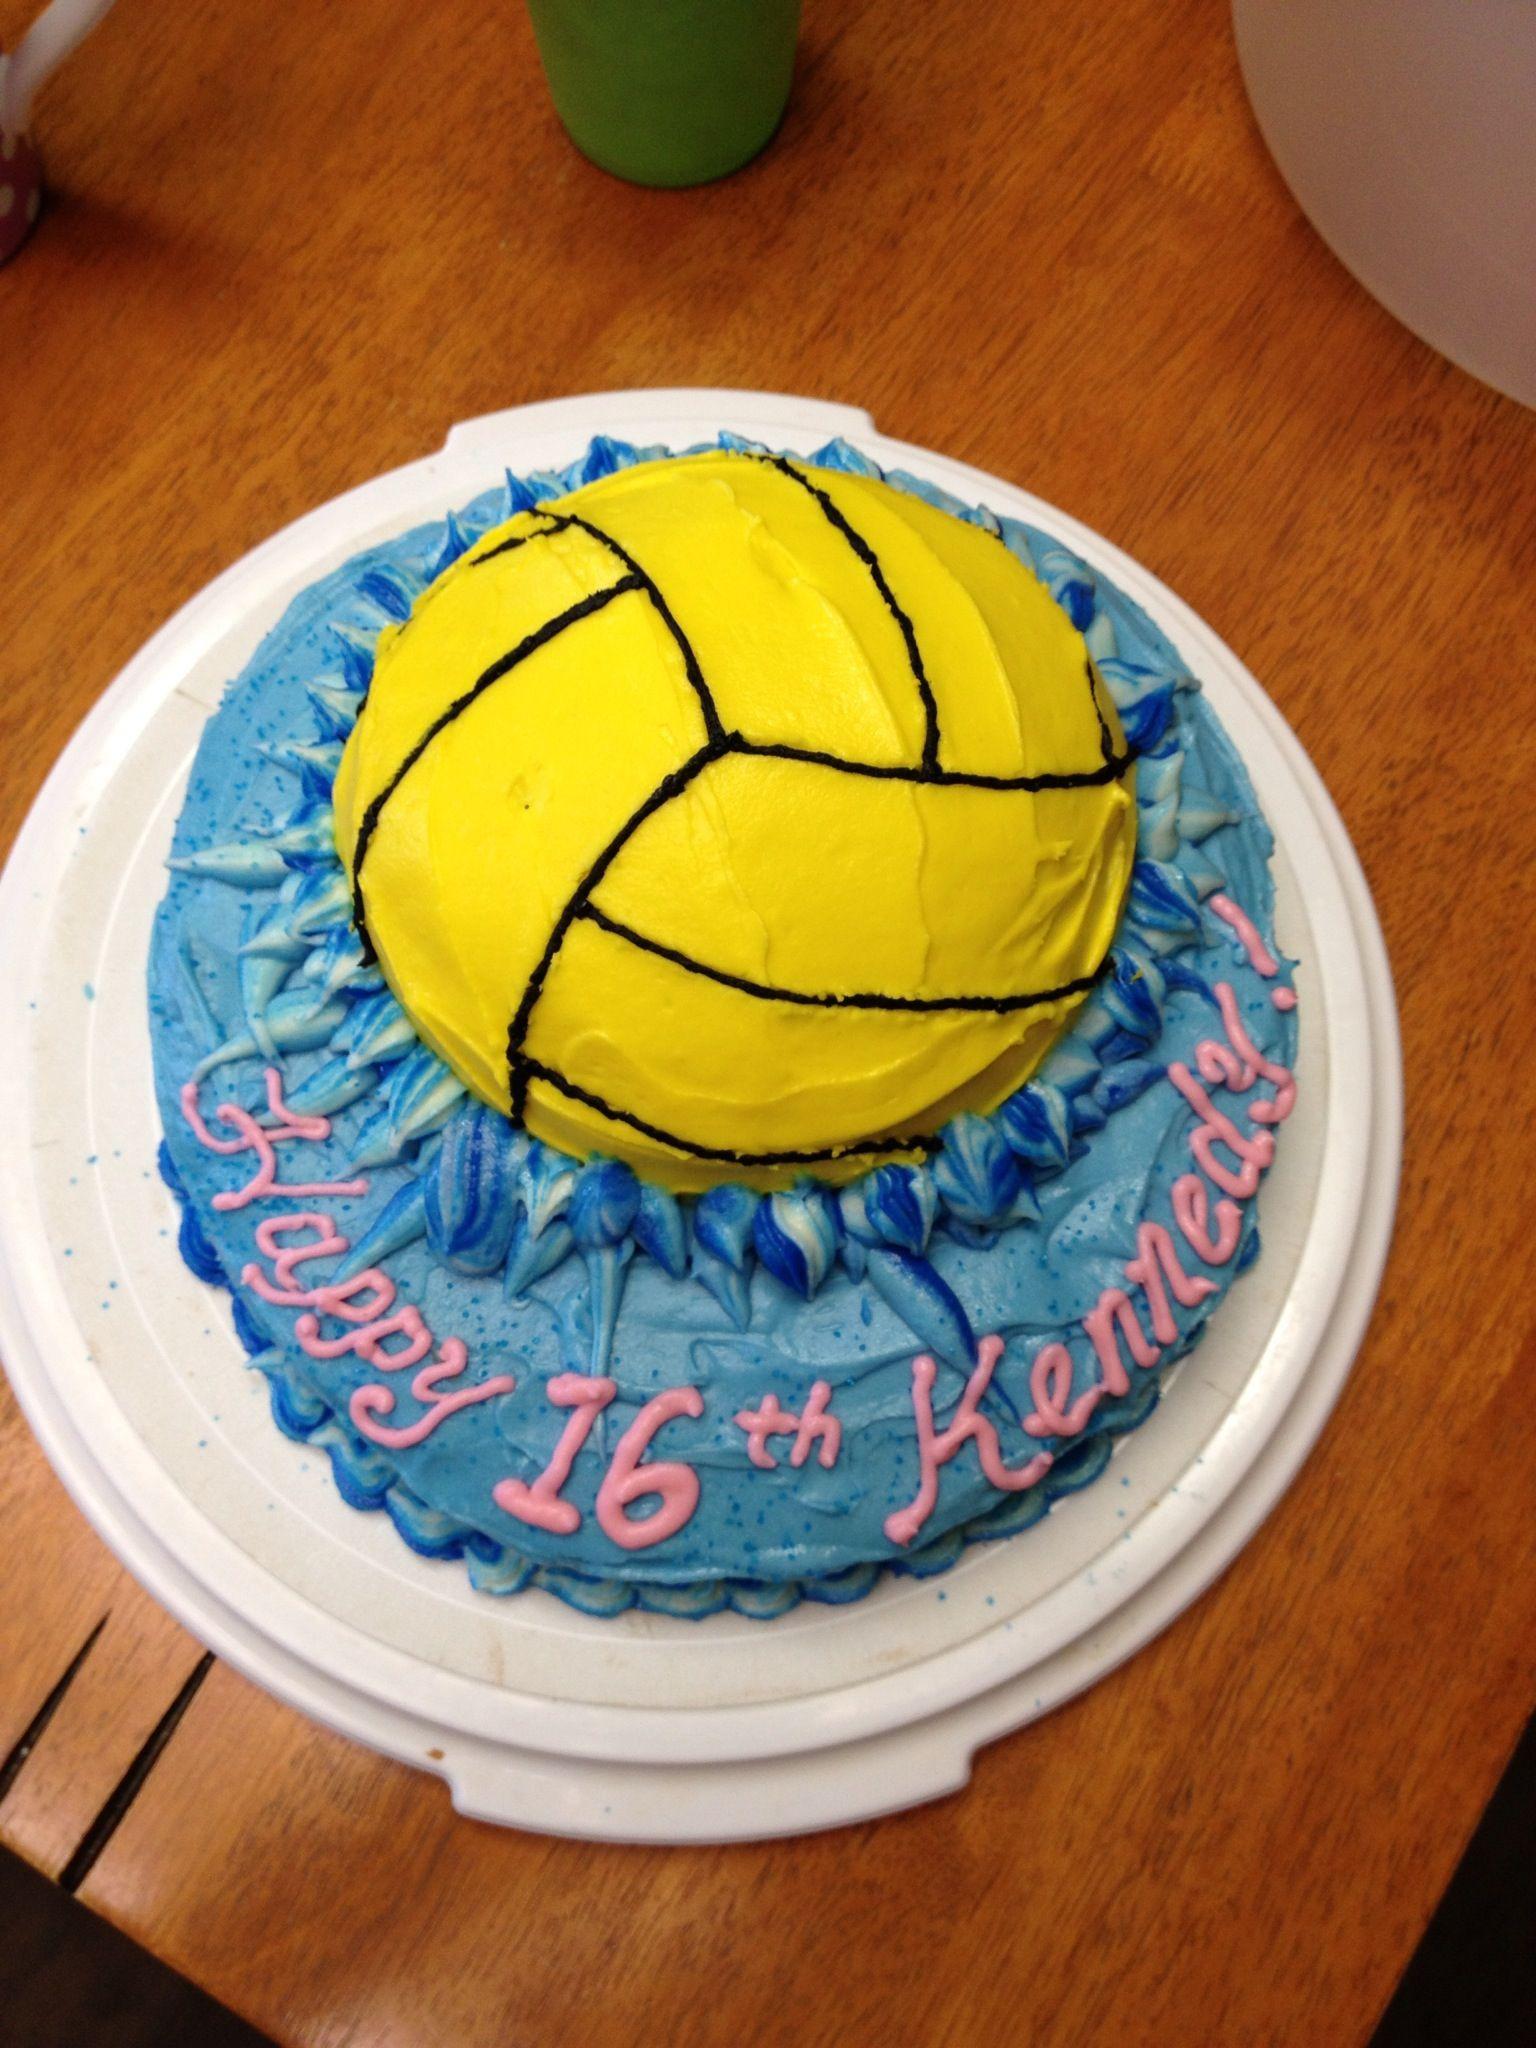 GlassyMama makes cakes too! ;) happy birthday K! Water